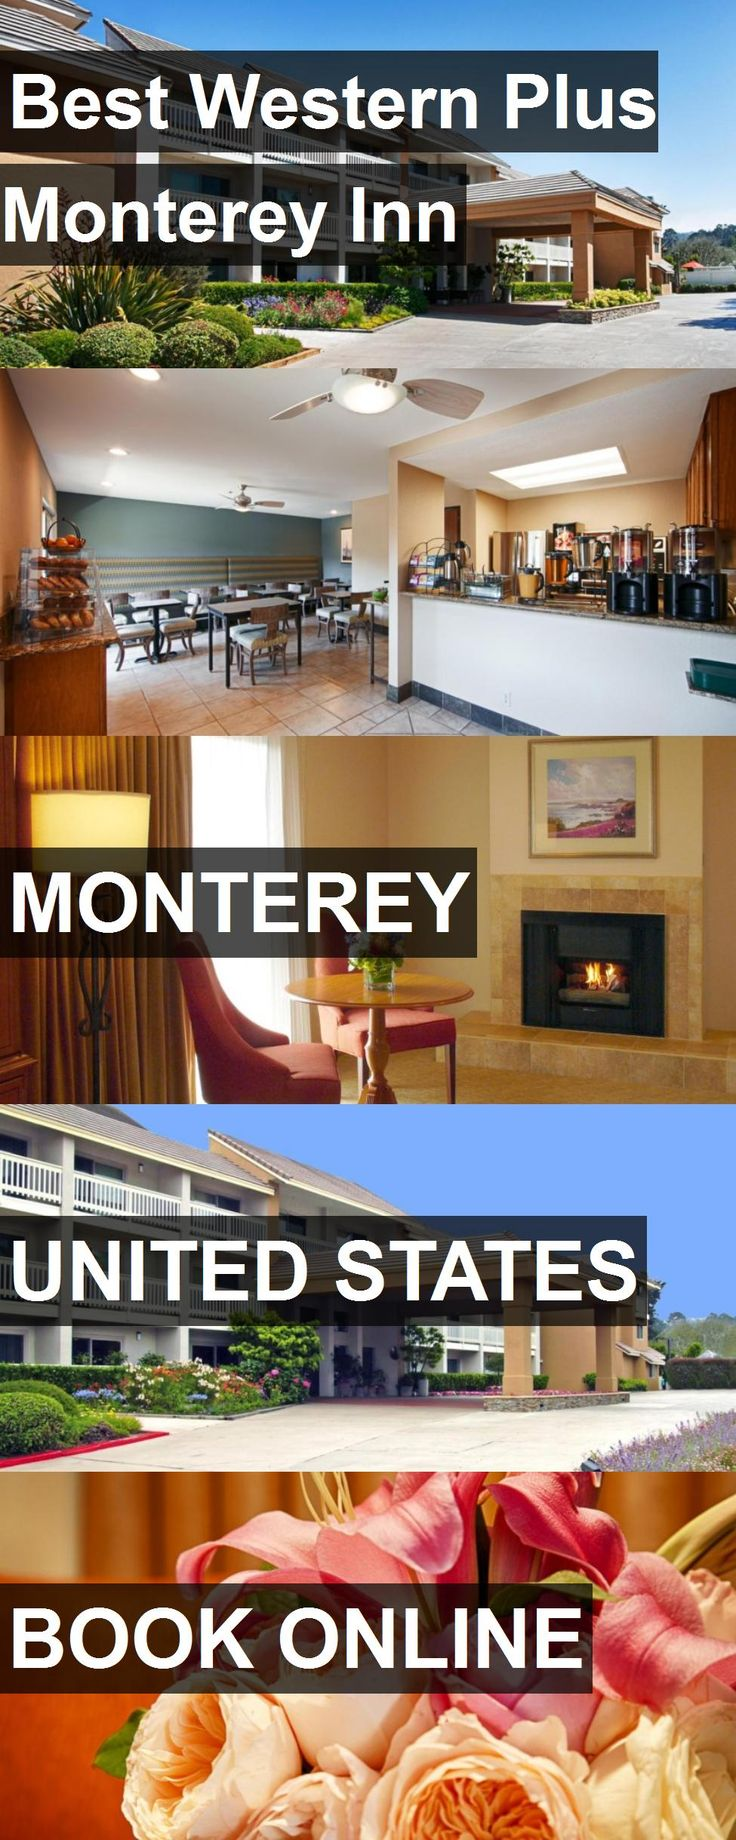 San Jose Monterey Map%0A Hotel Best Western Plus Monterey Inn in Monterey  United States  For more  information